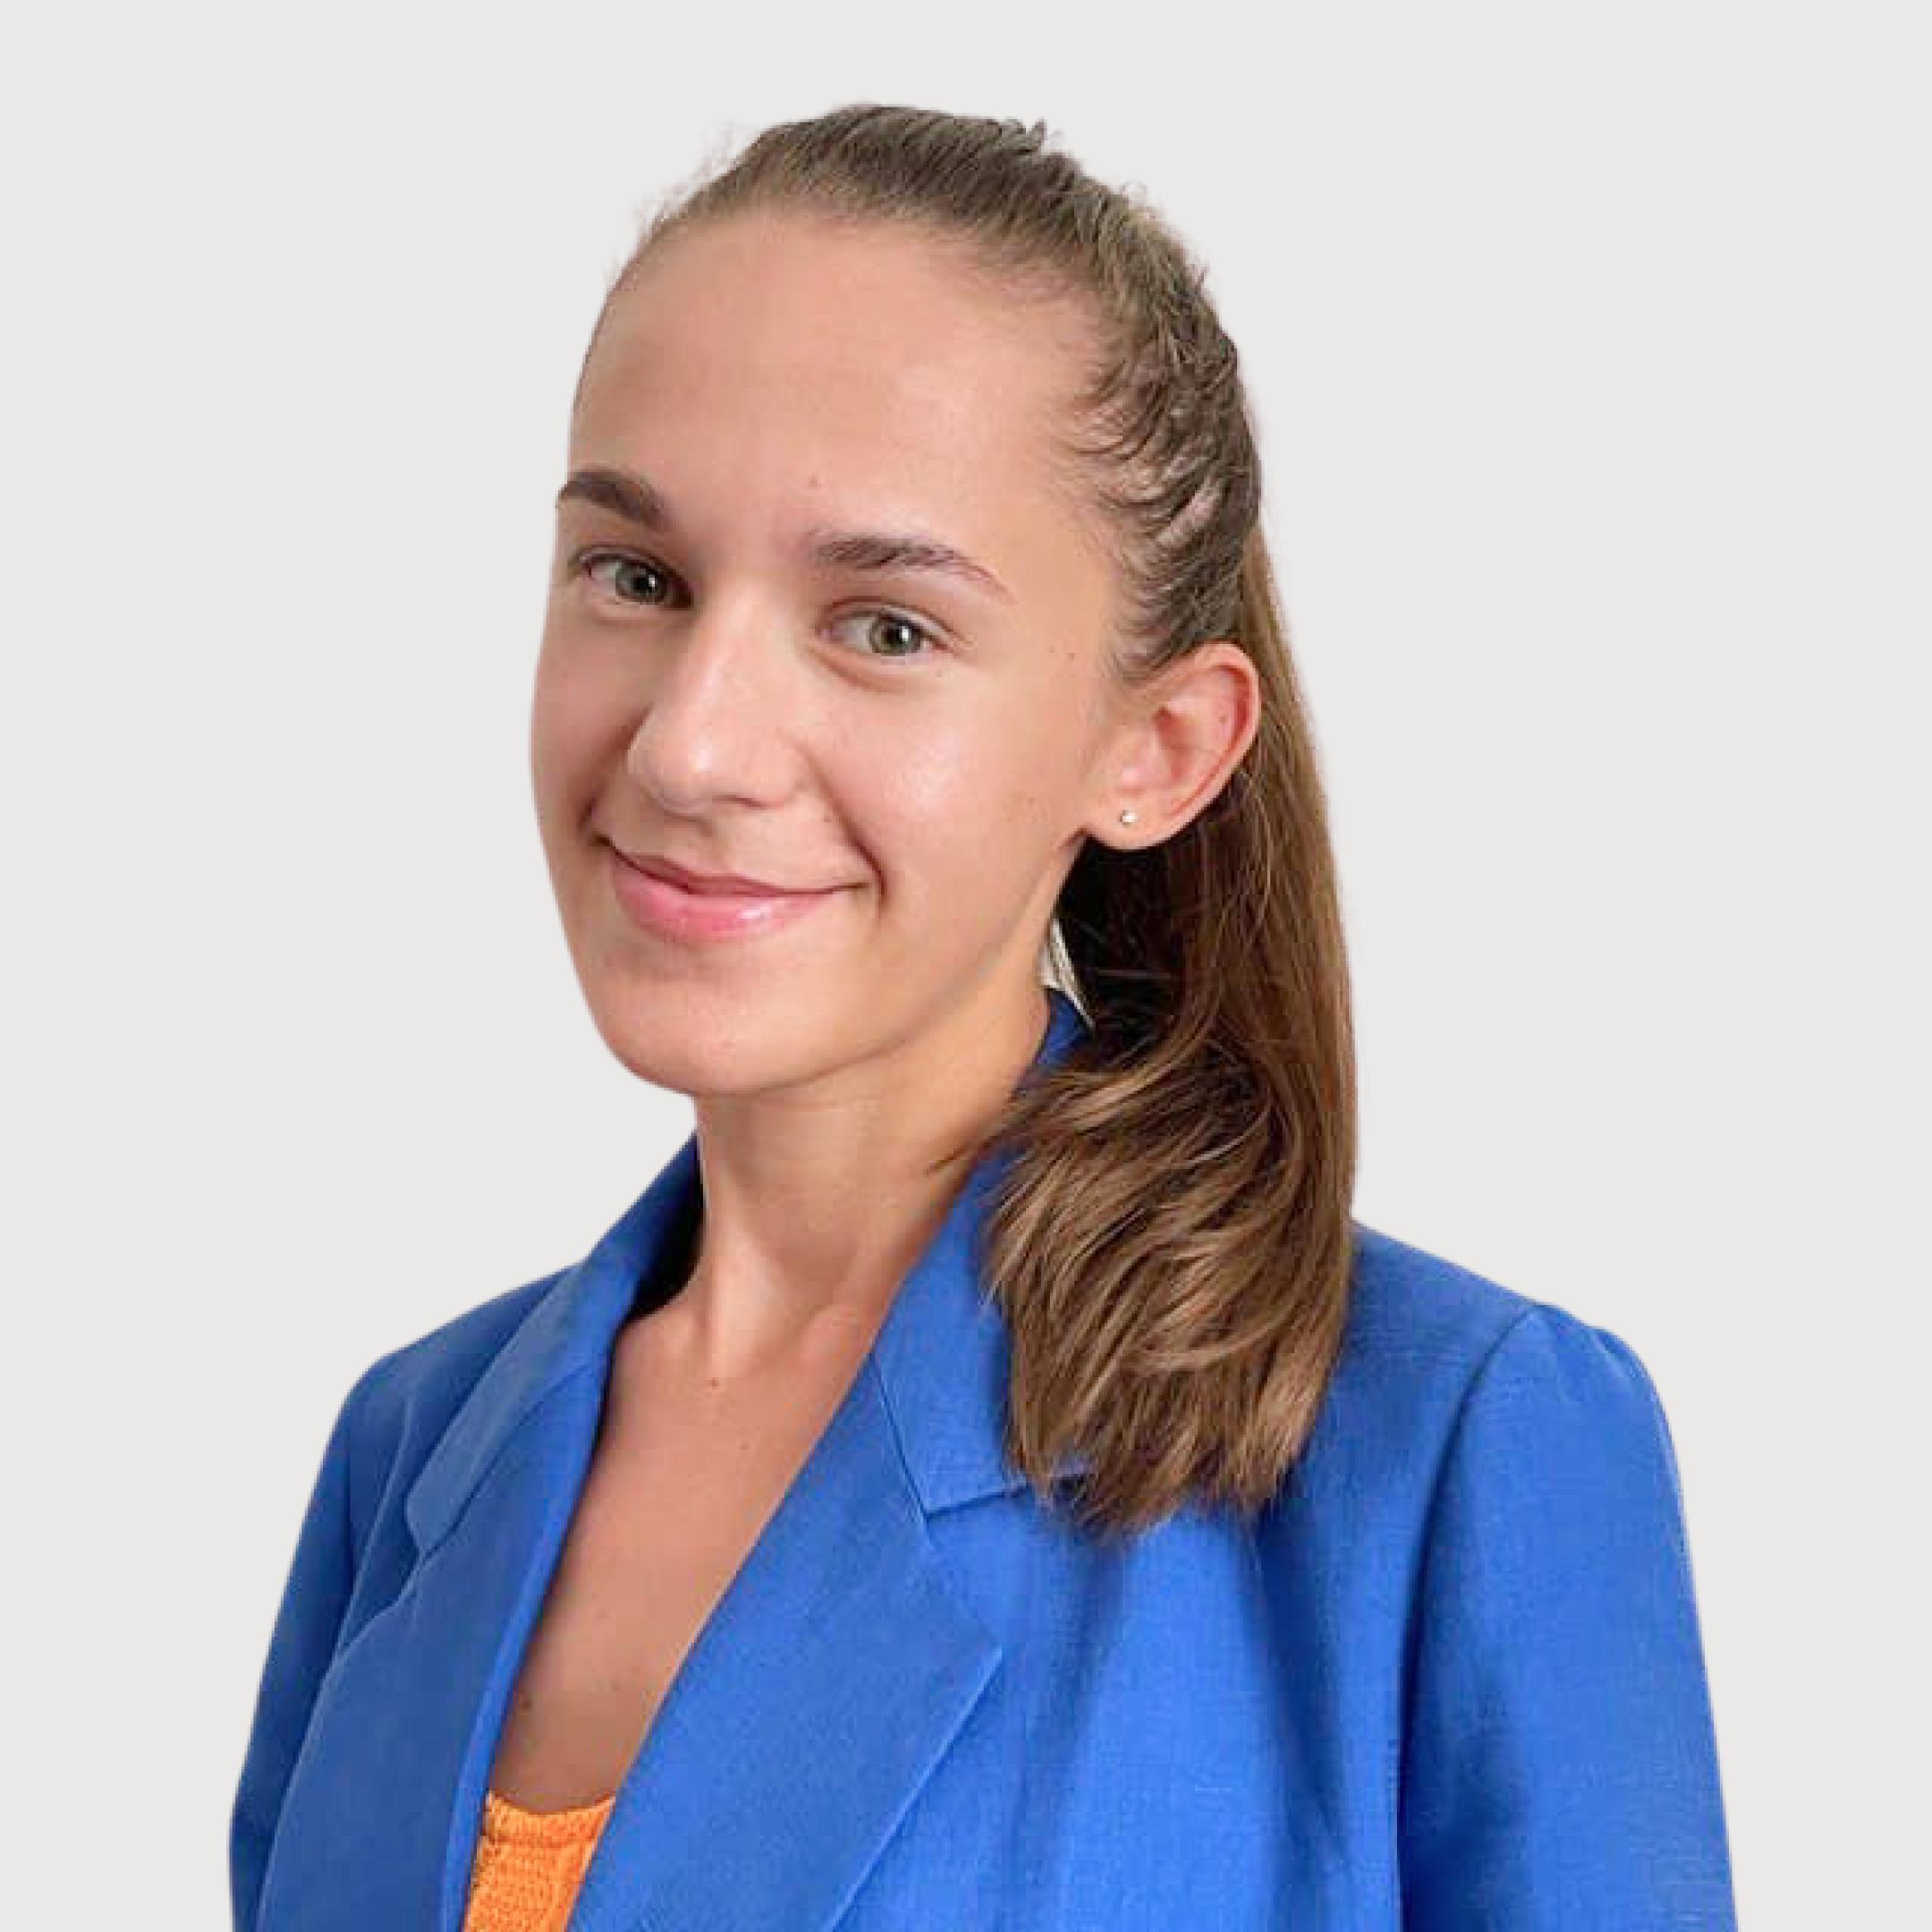 Viktoriia Borsuk's photo